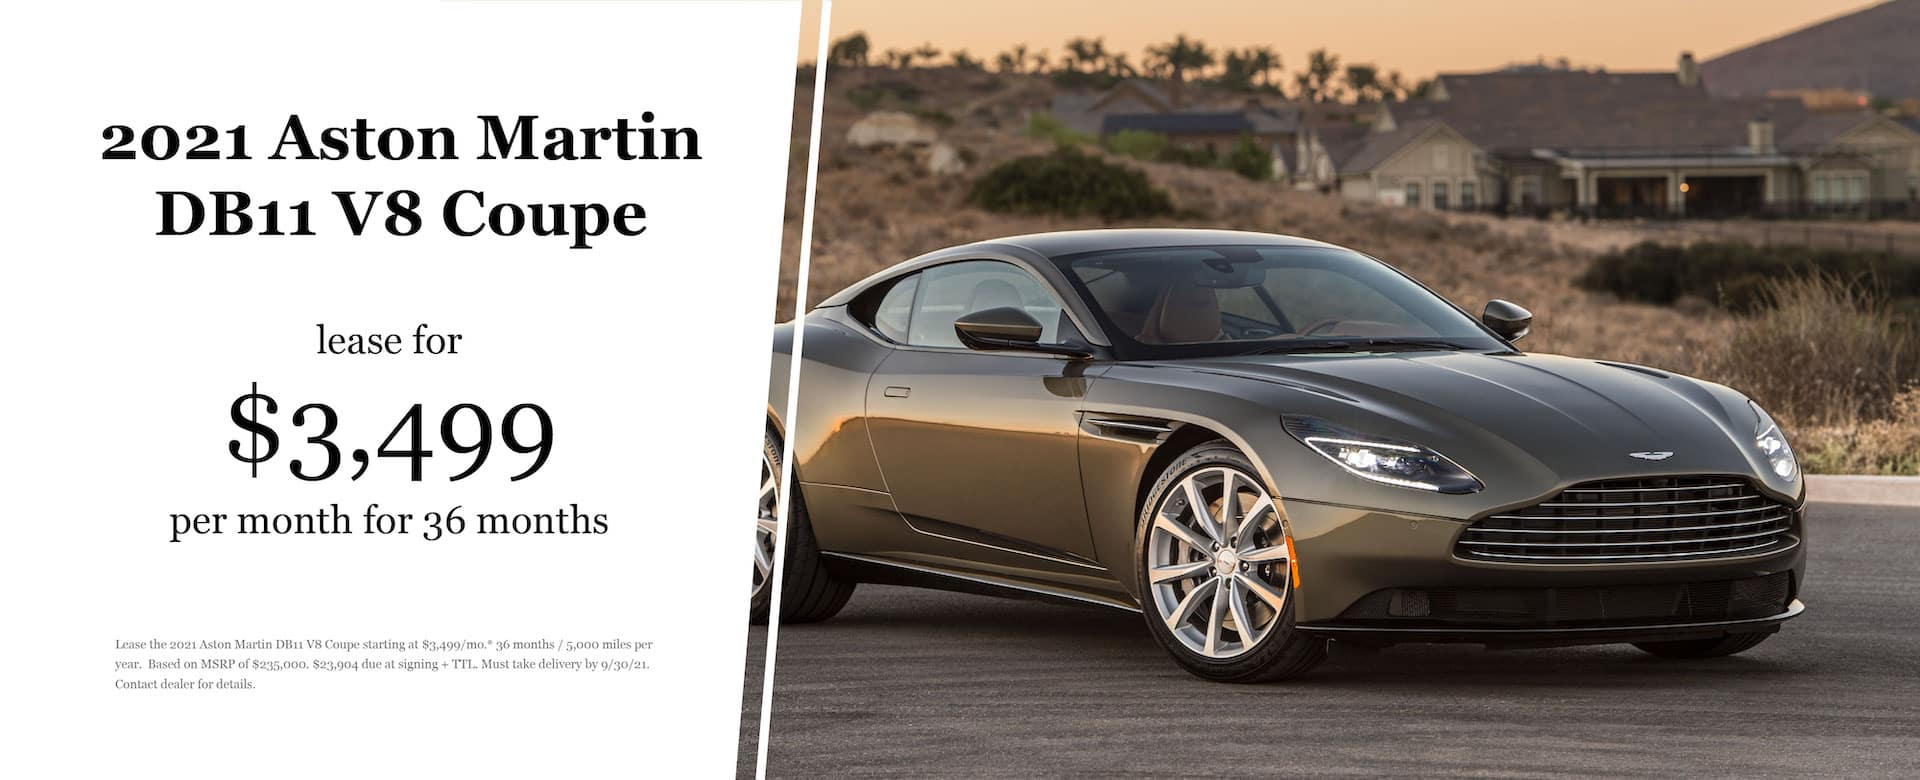 2021 Aston Martin DB11 Lease Offer